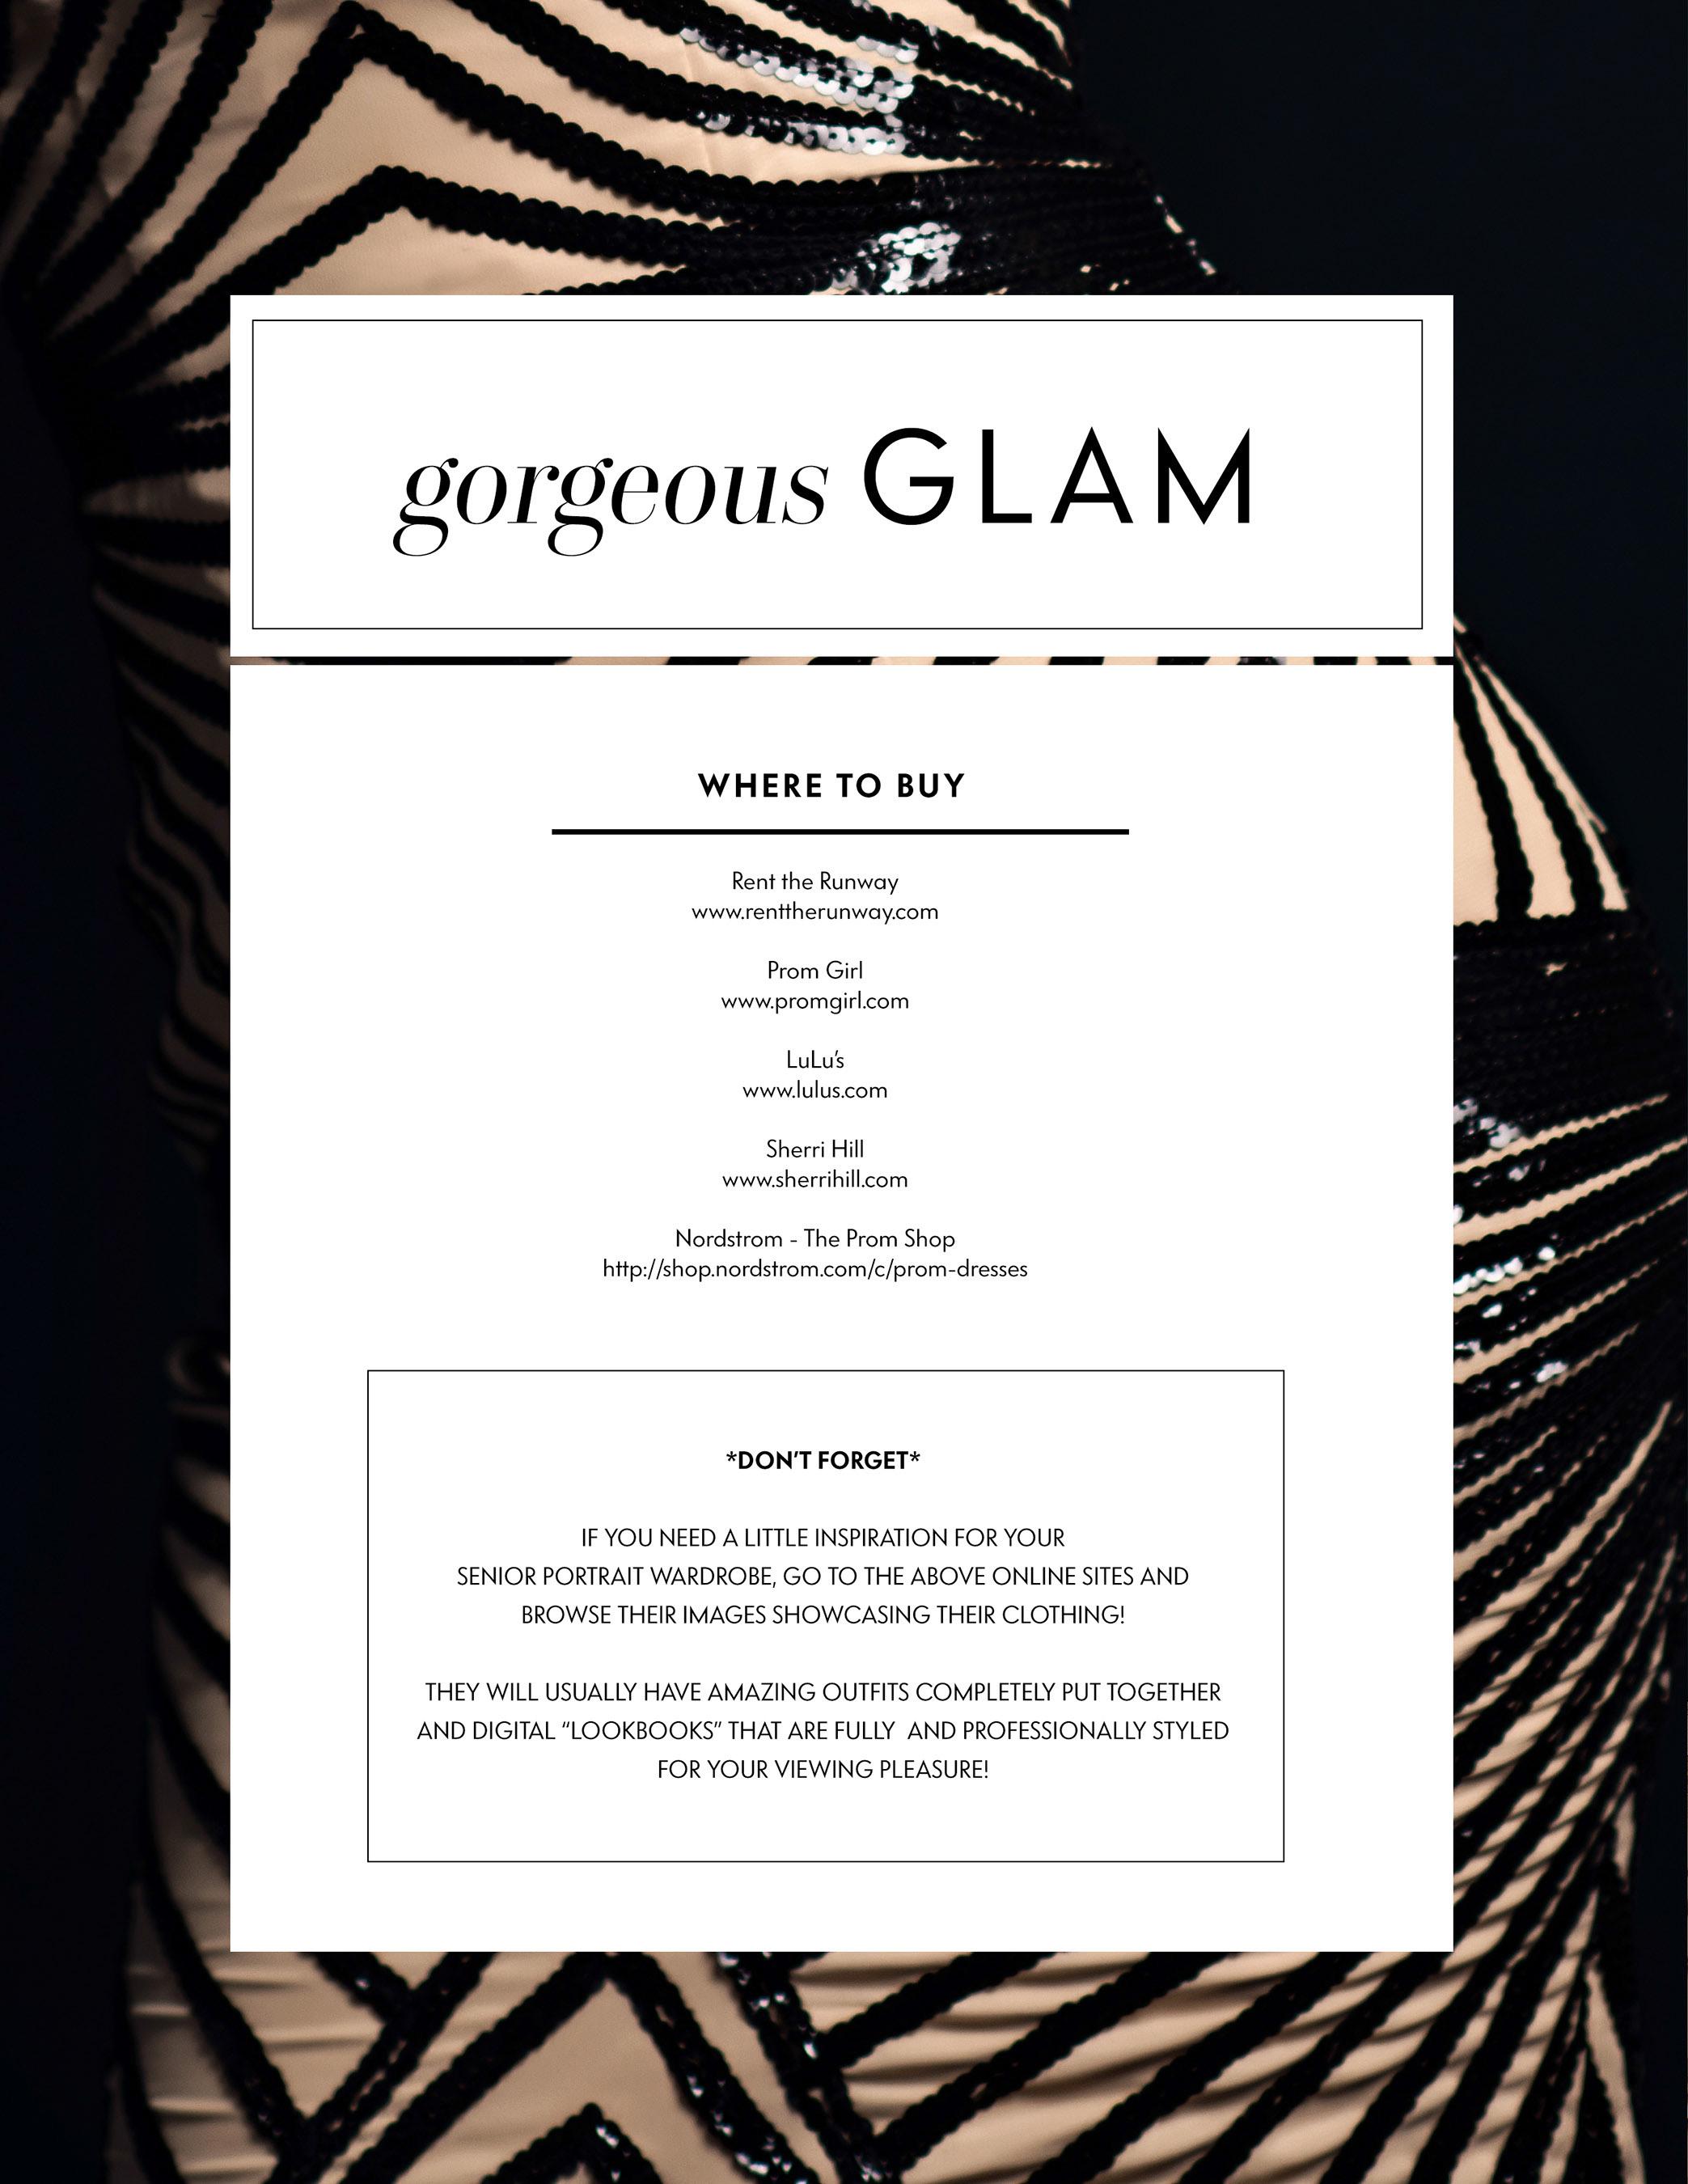 What to Wear Guide - Digital PDF-38-Left.jpg